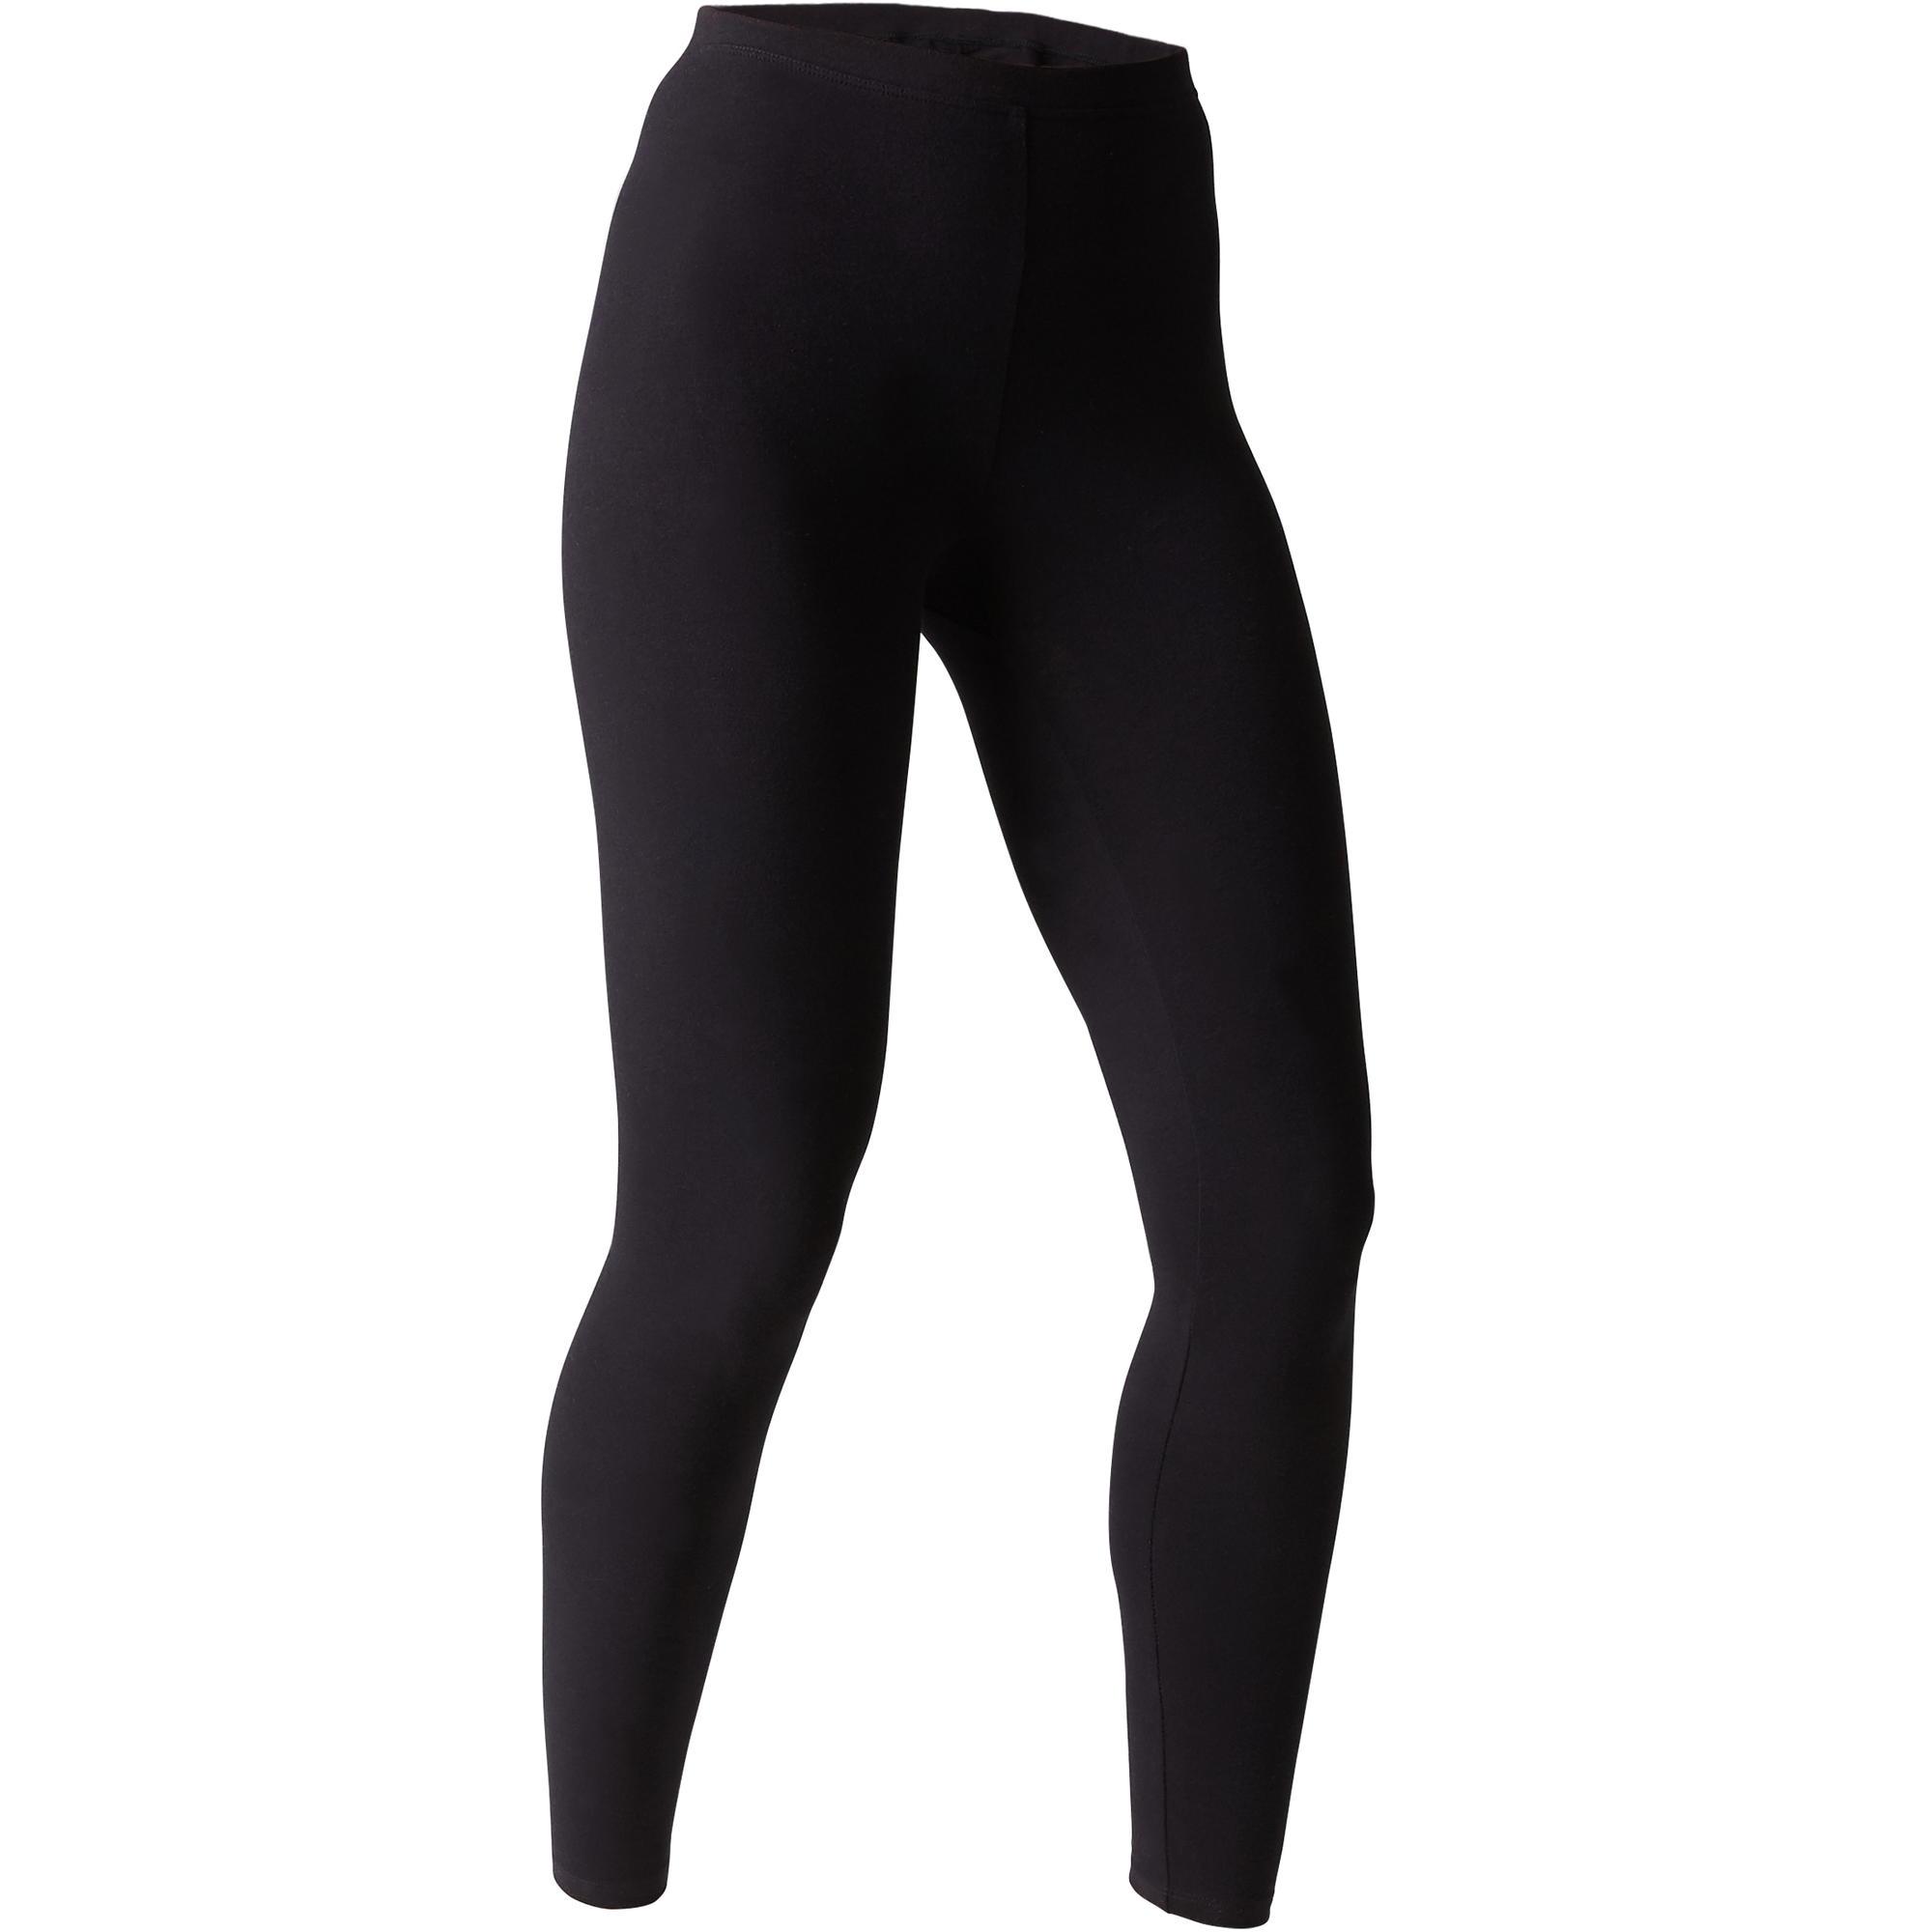 legging stretch 100 slim pilates gym douce femme noir domyos by decathlon 8511784 1507731.jpg 353eafe36b0